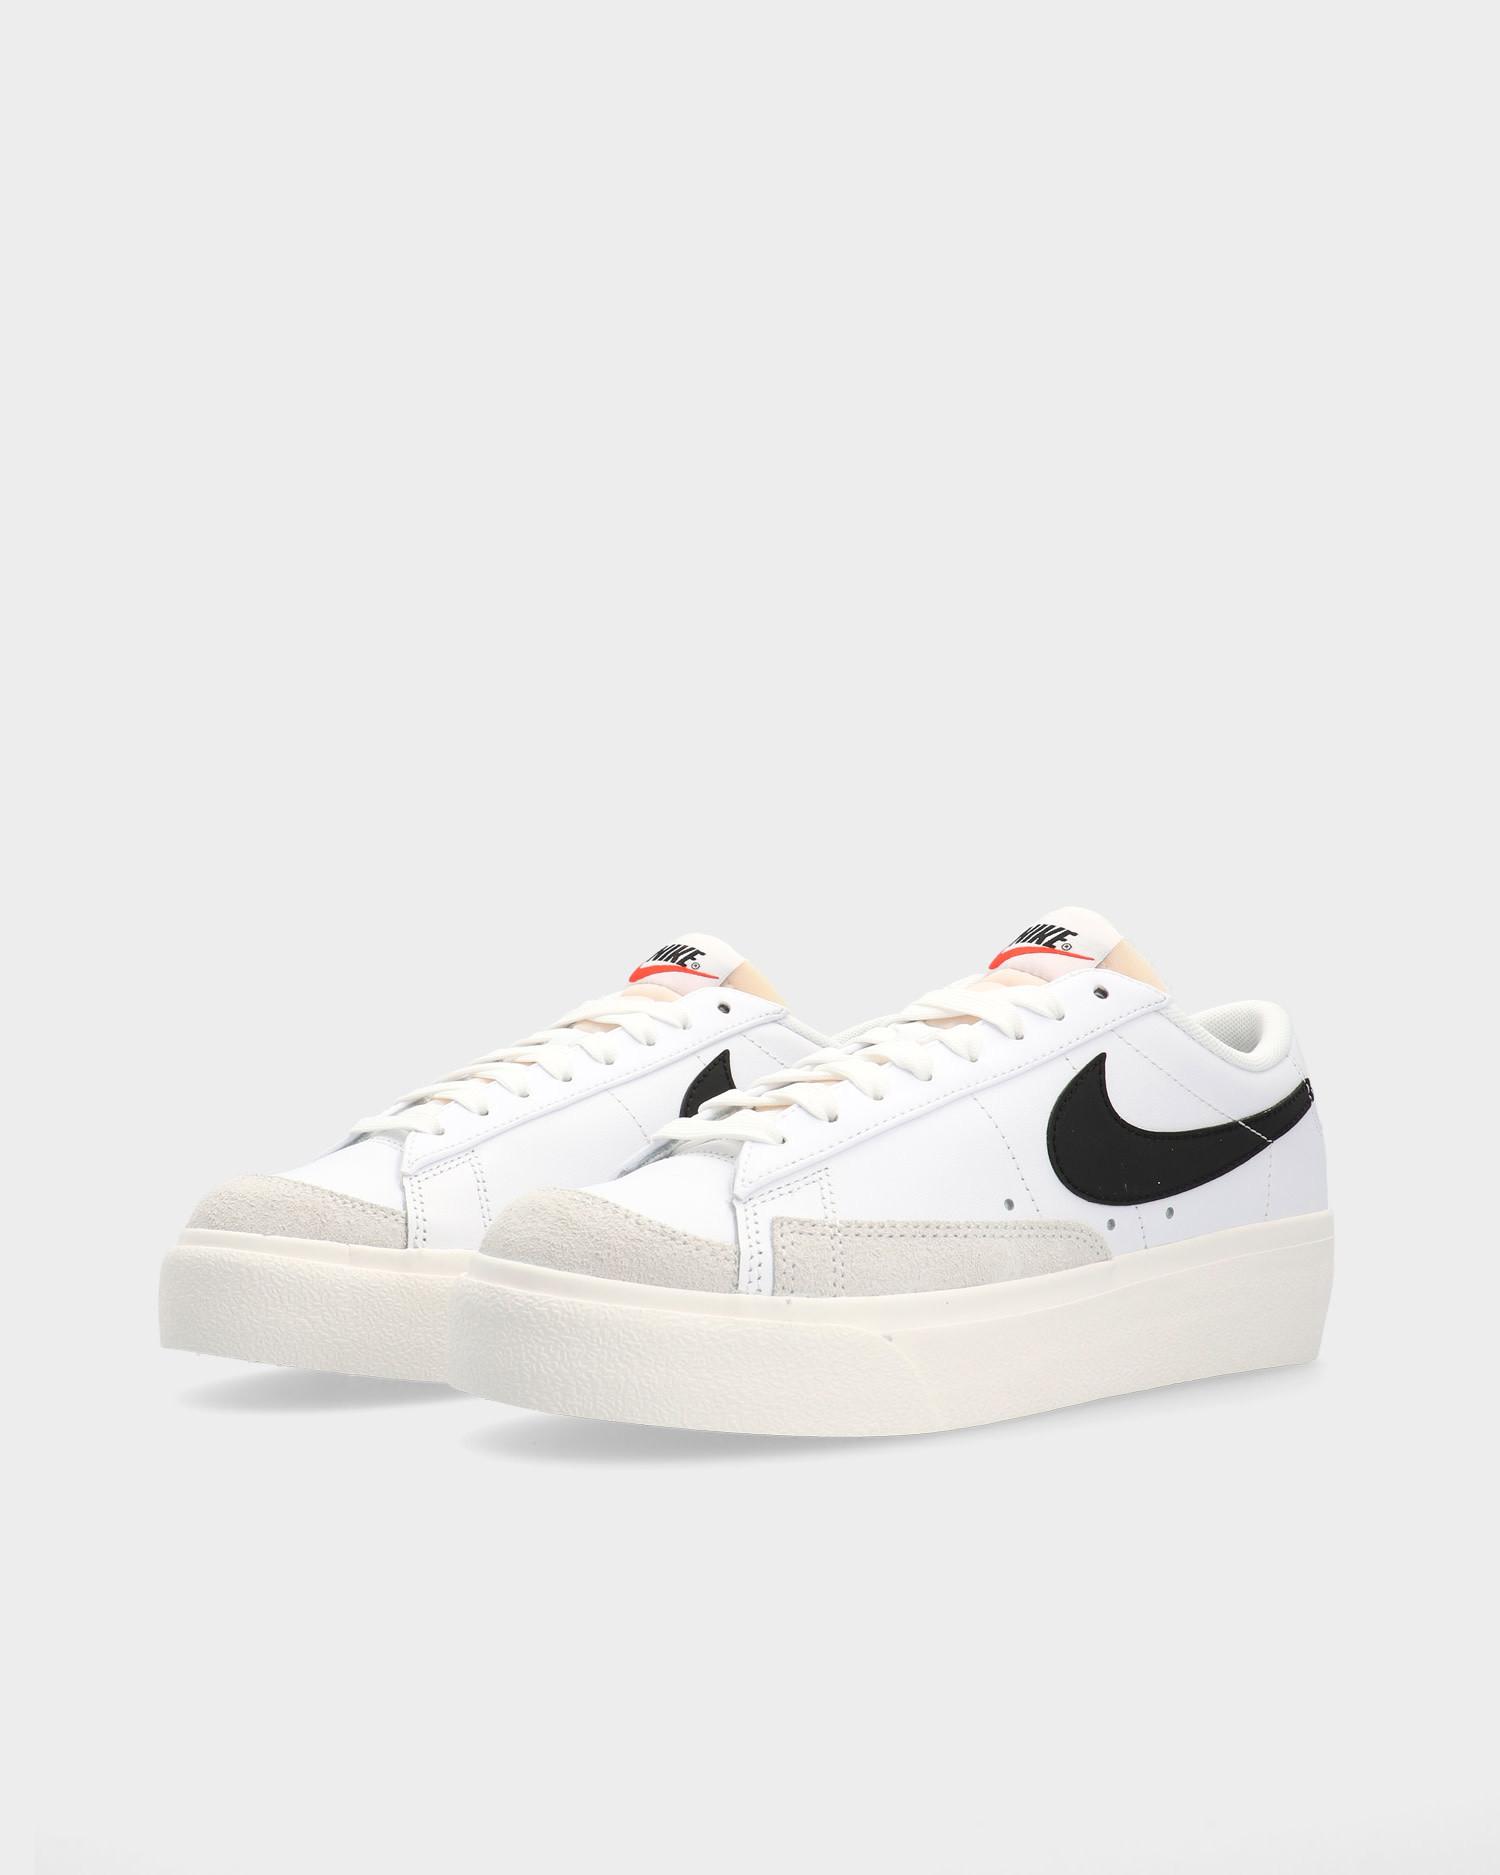 Nike Blazer Low Platform White/Black-Sail-Team Orange